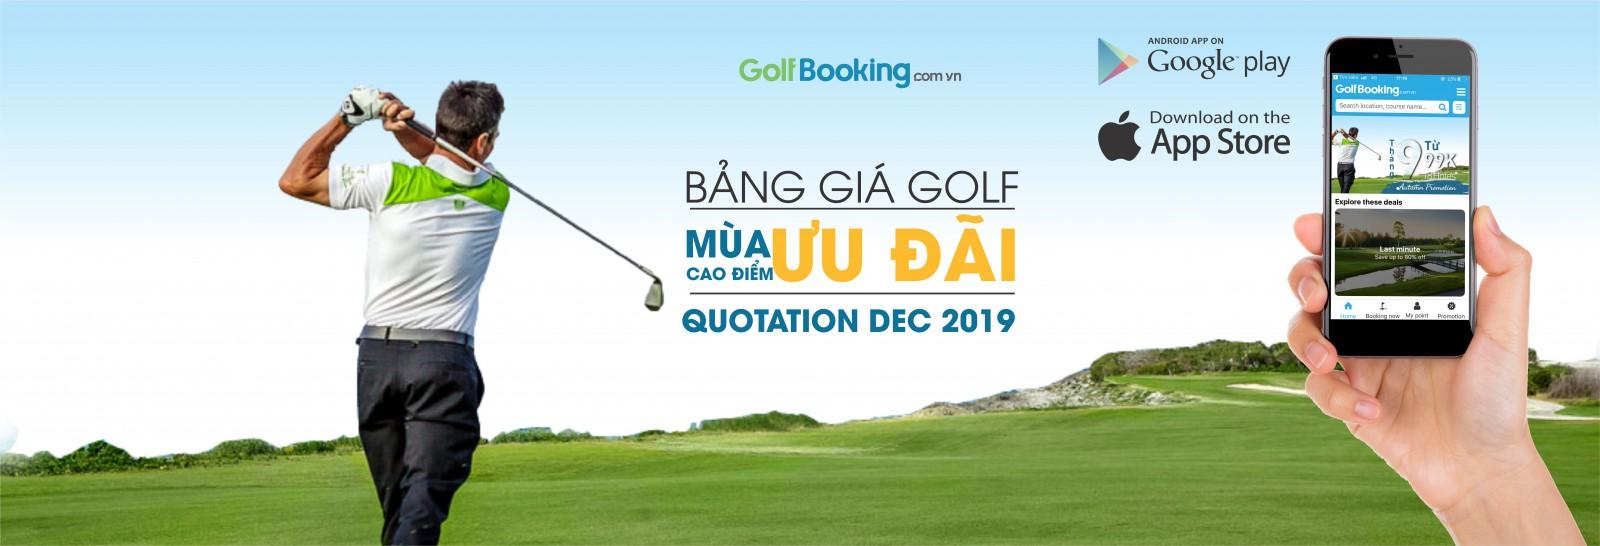 golf booking WEB